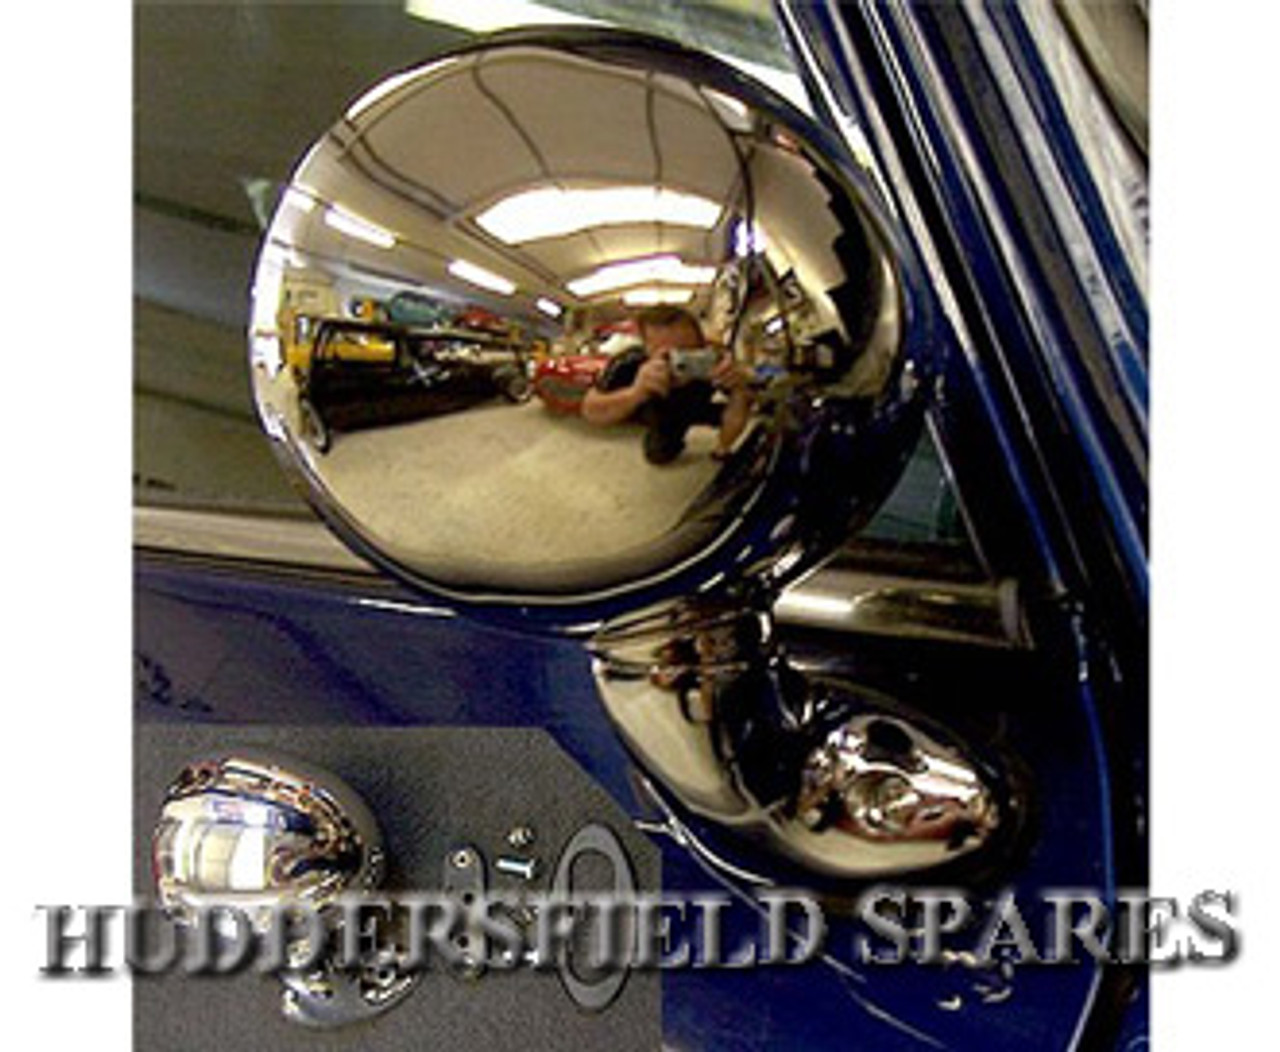 Stainless steel evolution bullet mirrors